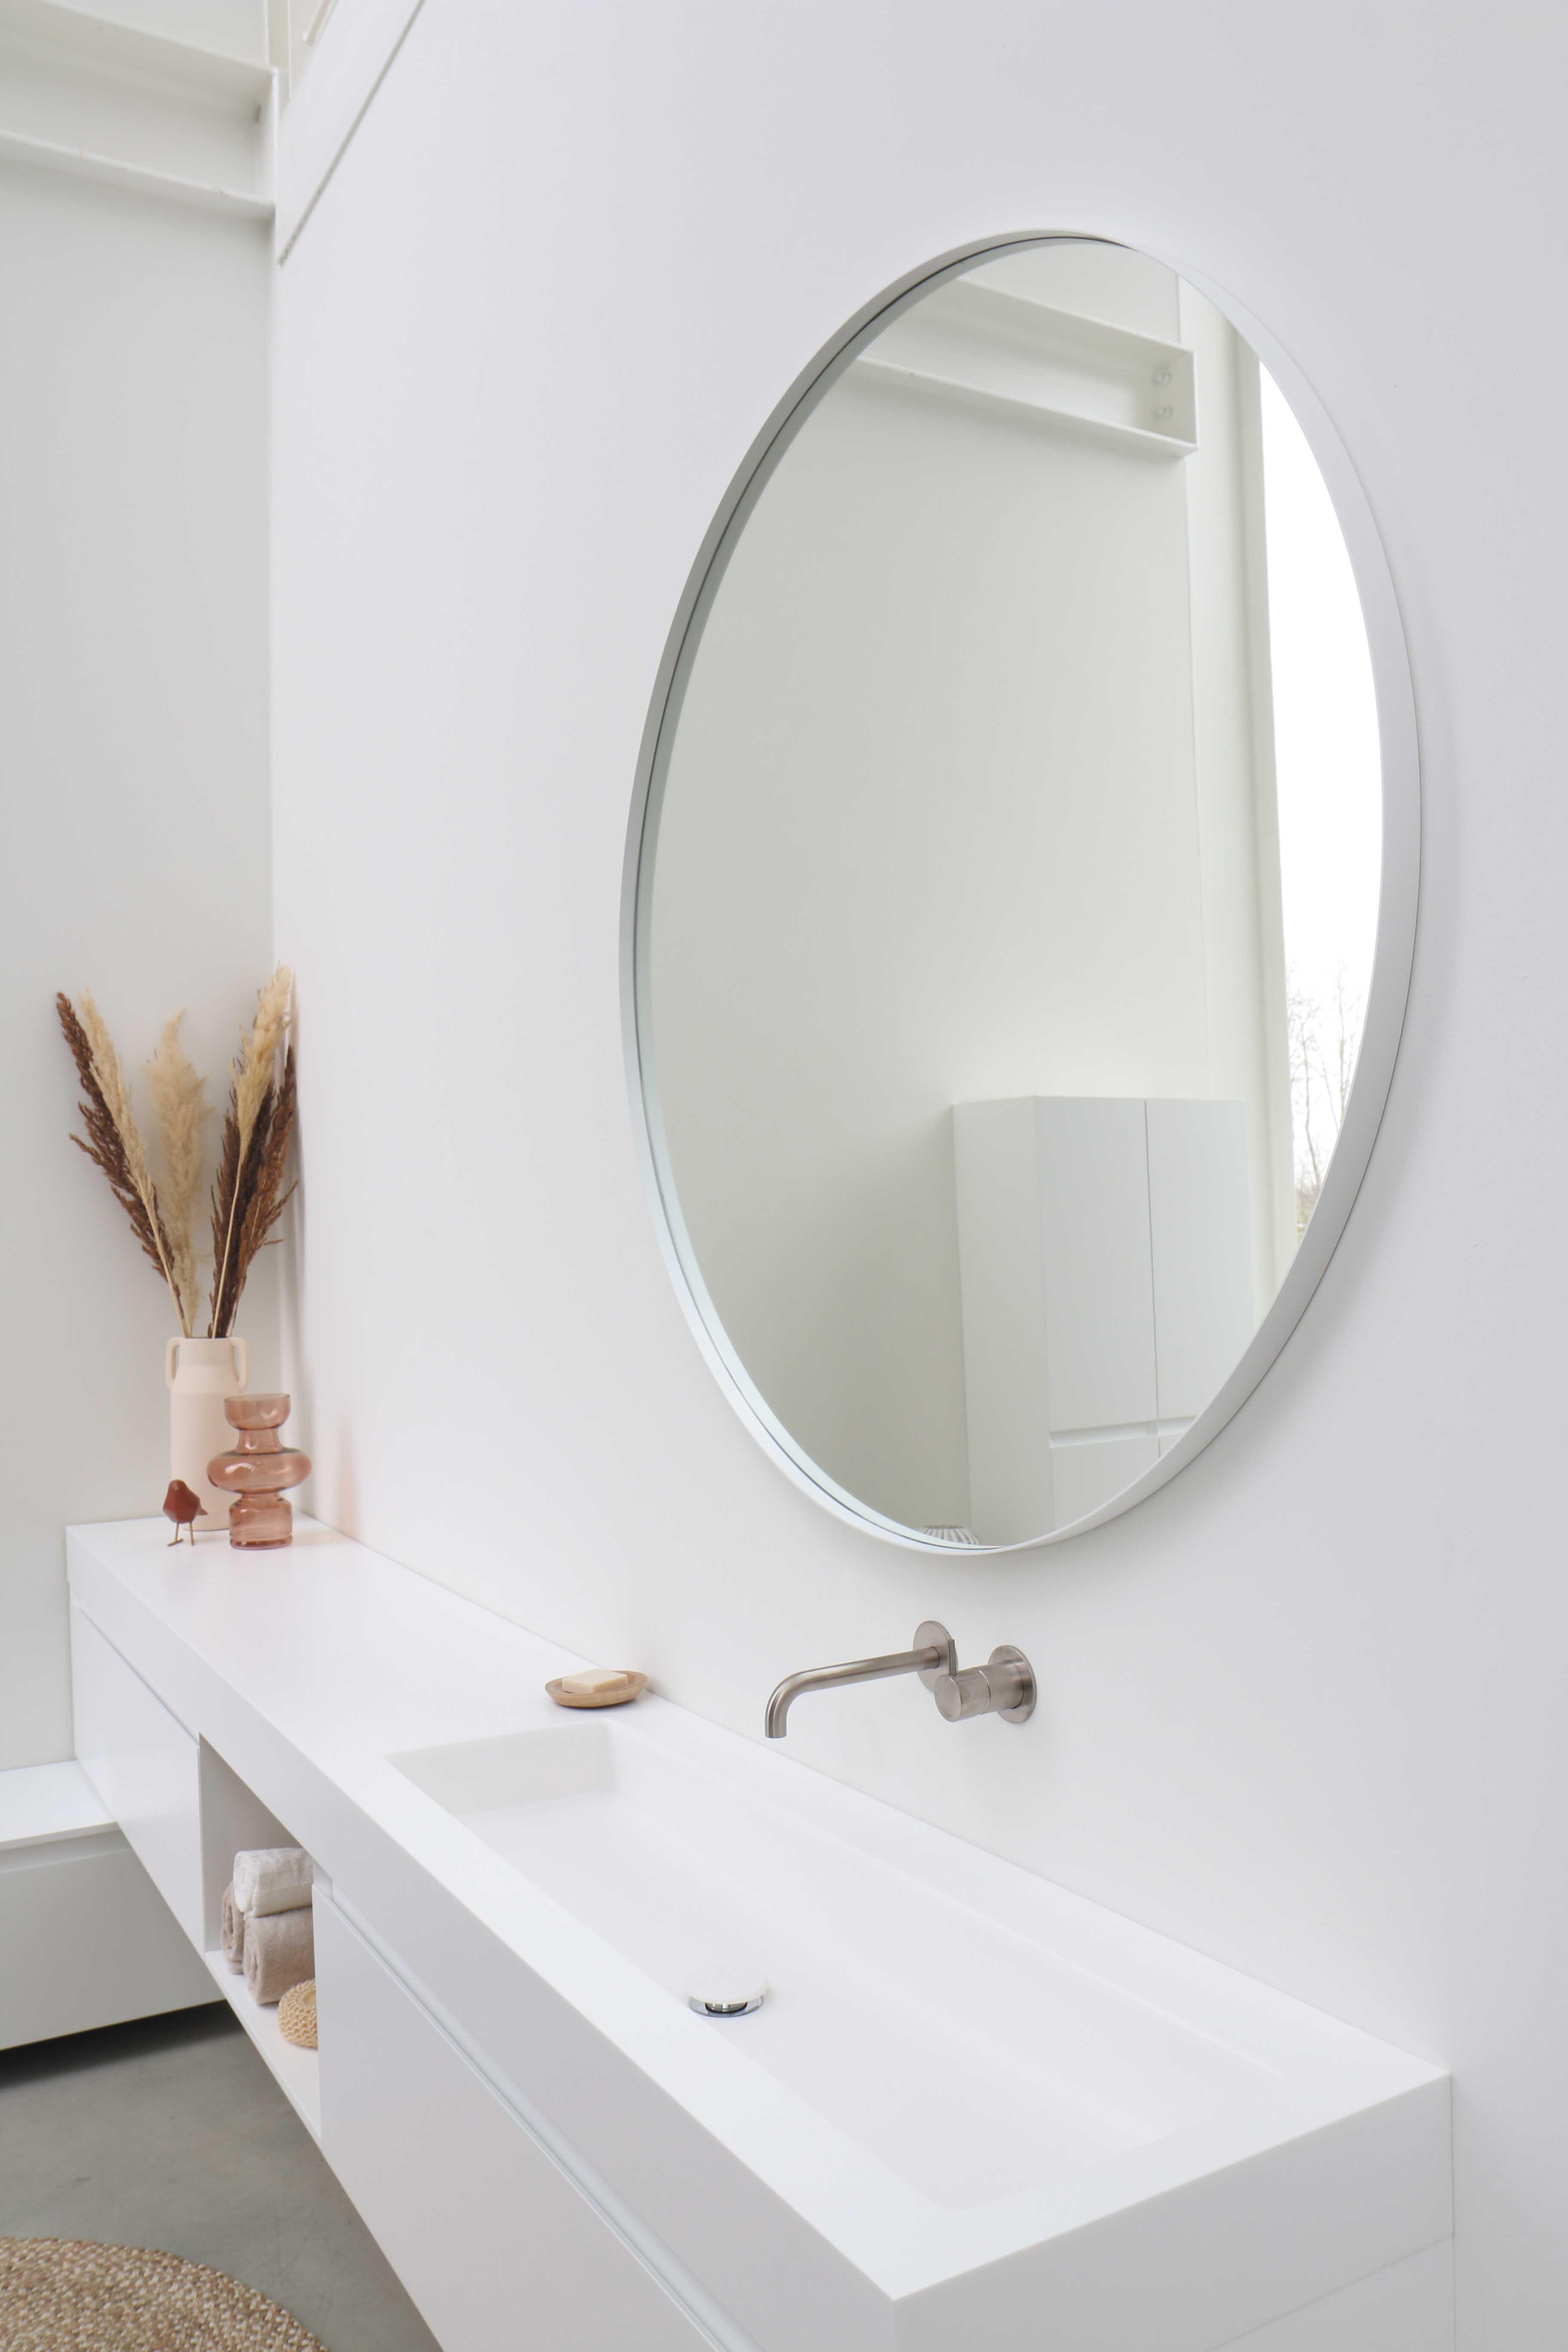 Ink spiegel verzonken in kader rond 60 cm, aluminium, mat wit